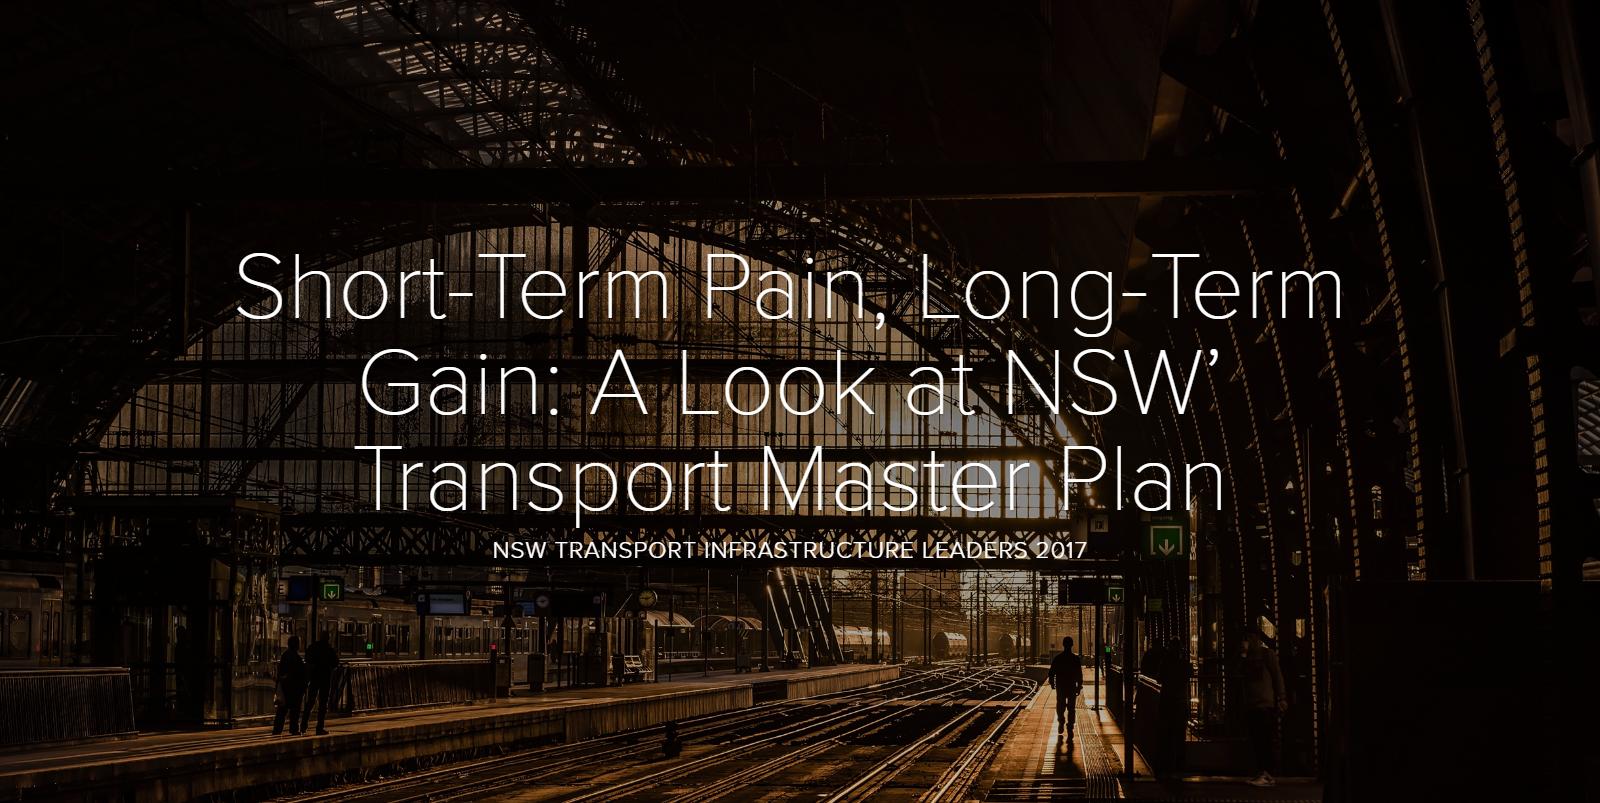 Short-Term Pain, Long-Term Gain: A Look at NSW' Transport Master Plan